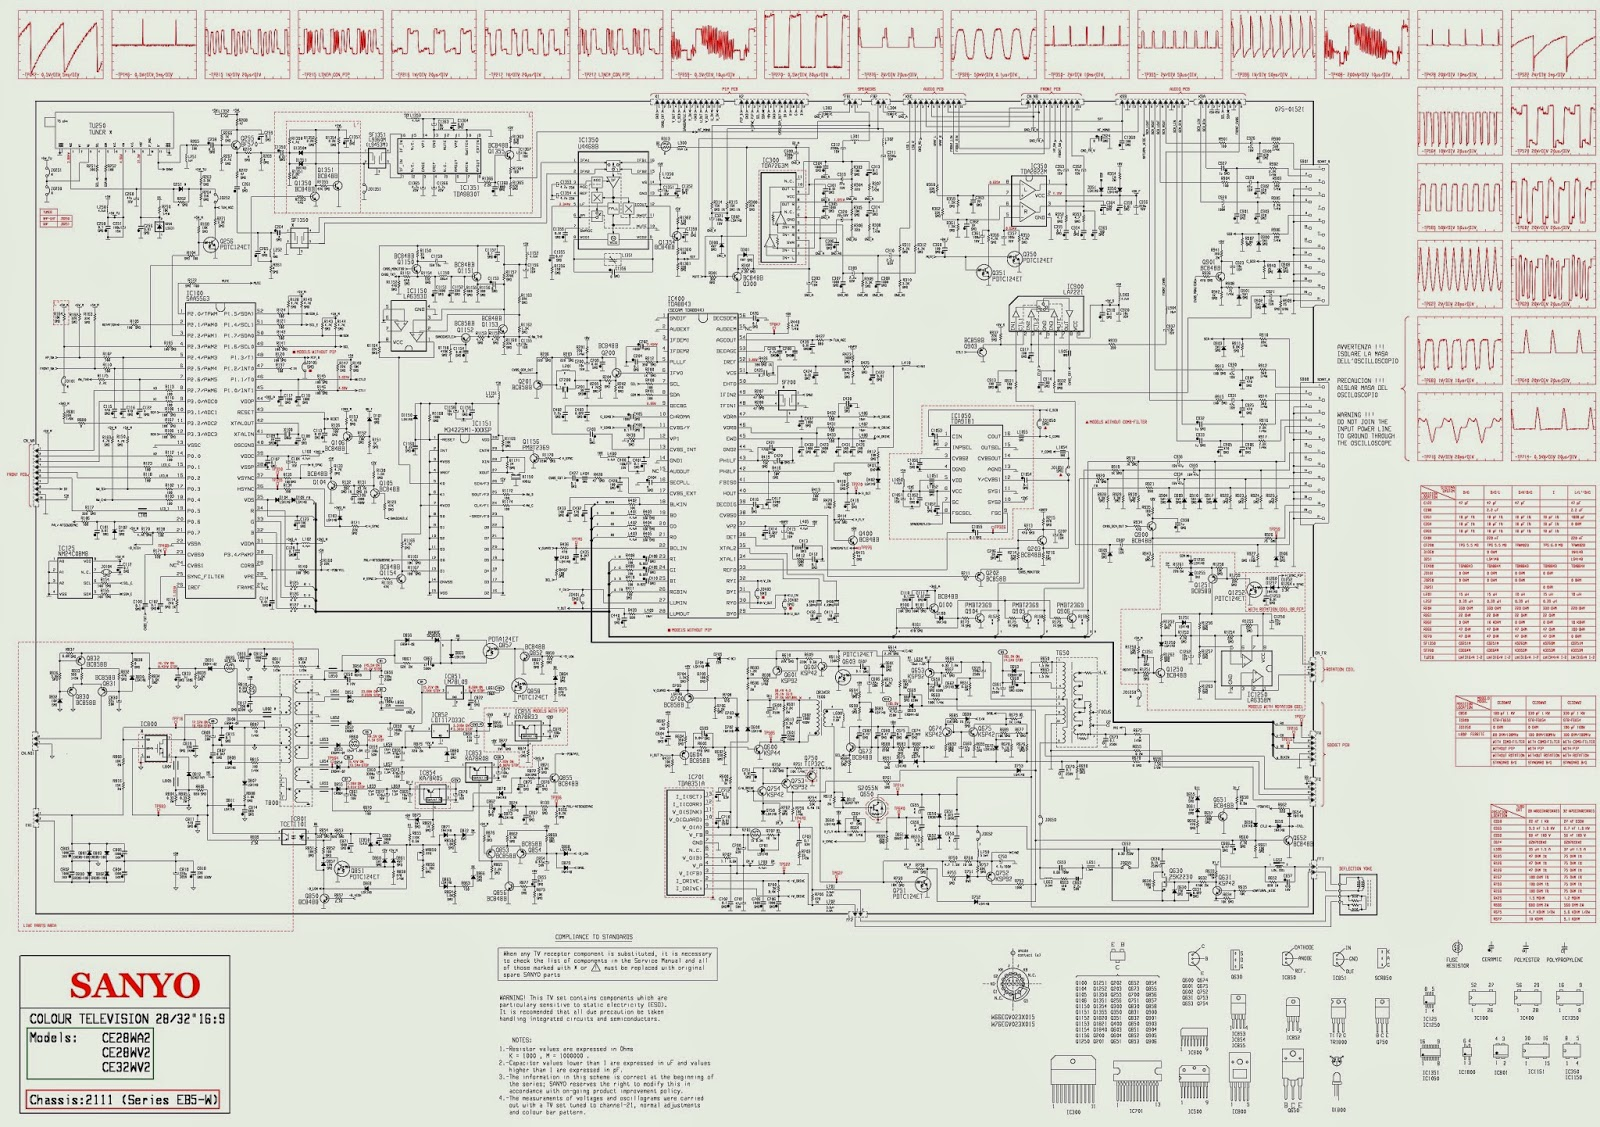 sanyo tv diagram wiring diagram u2022 rh championapp co Cable TV Wiring Diagram Direct TV to HDMI Wiring-Diagram